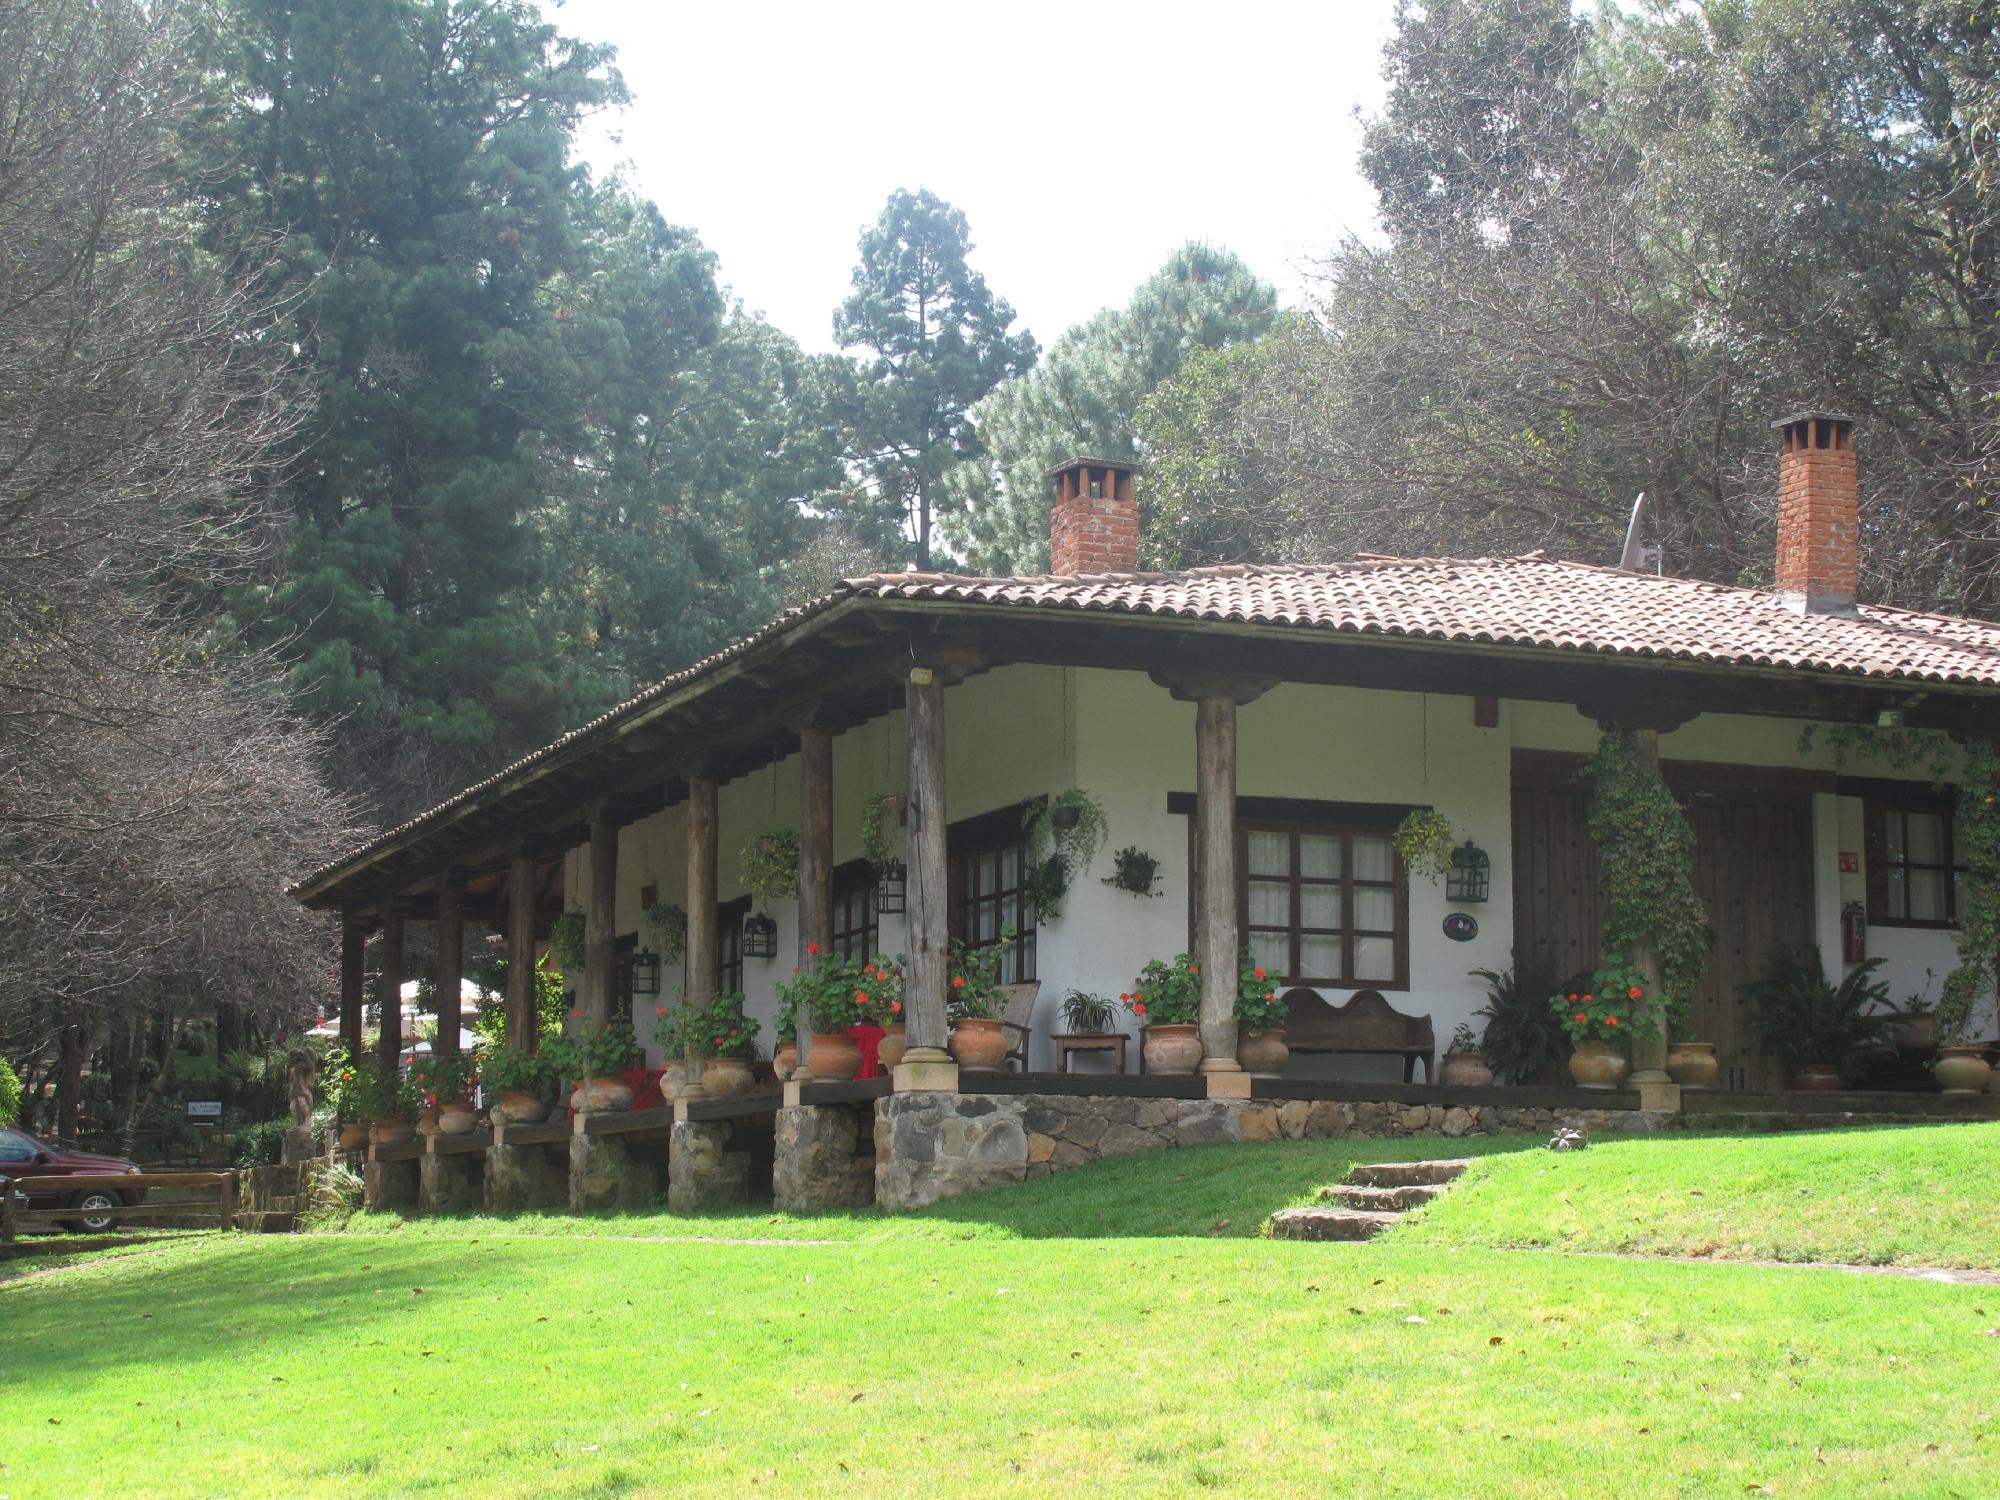 Hacienda Las Mariposas